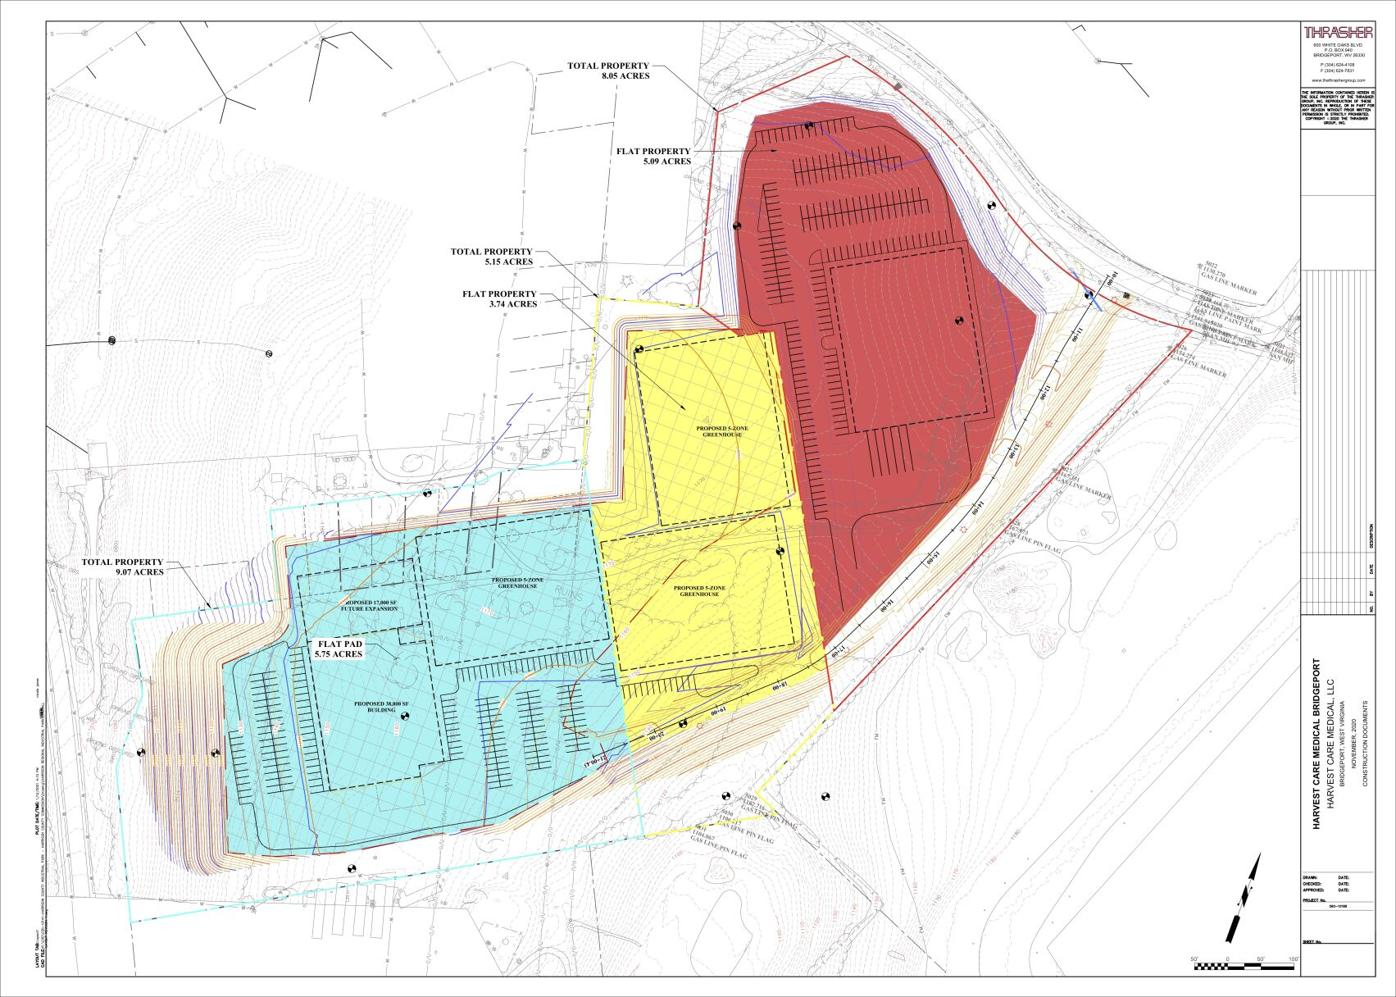 Harrison Regional Industrial Park site drawing